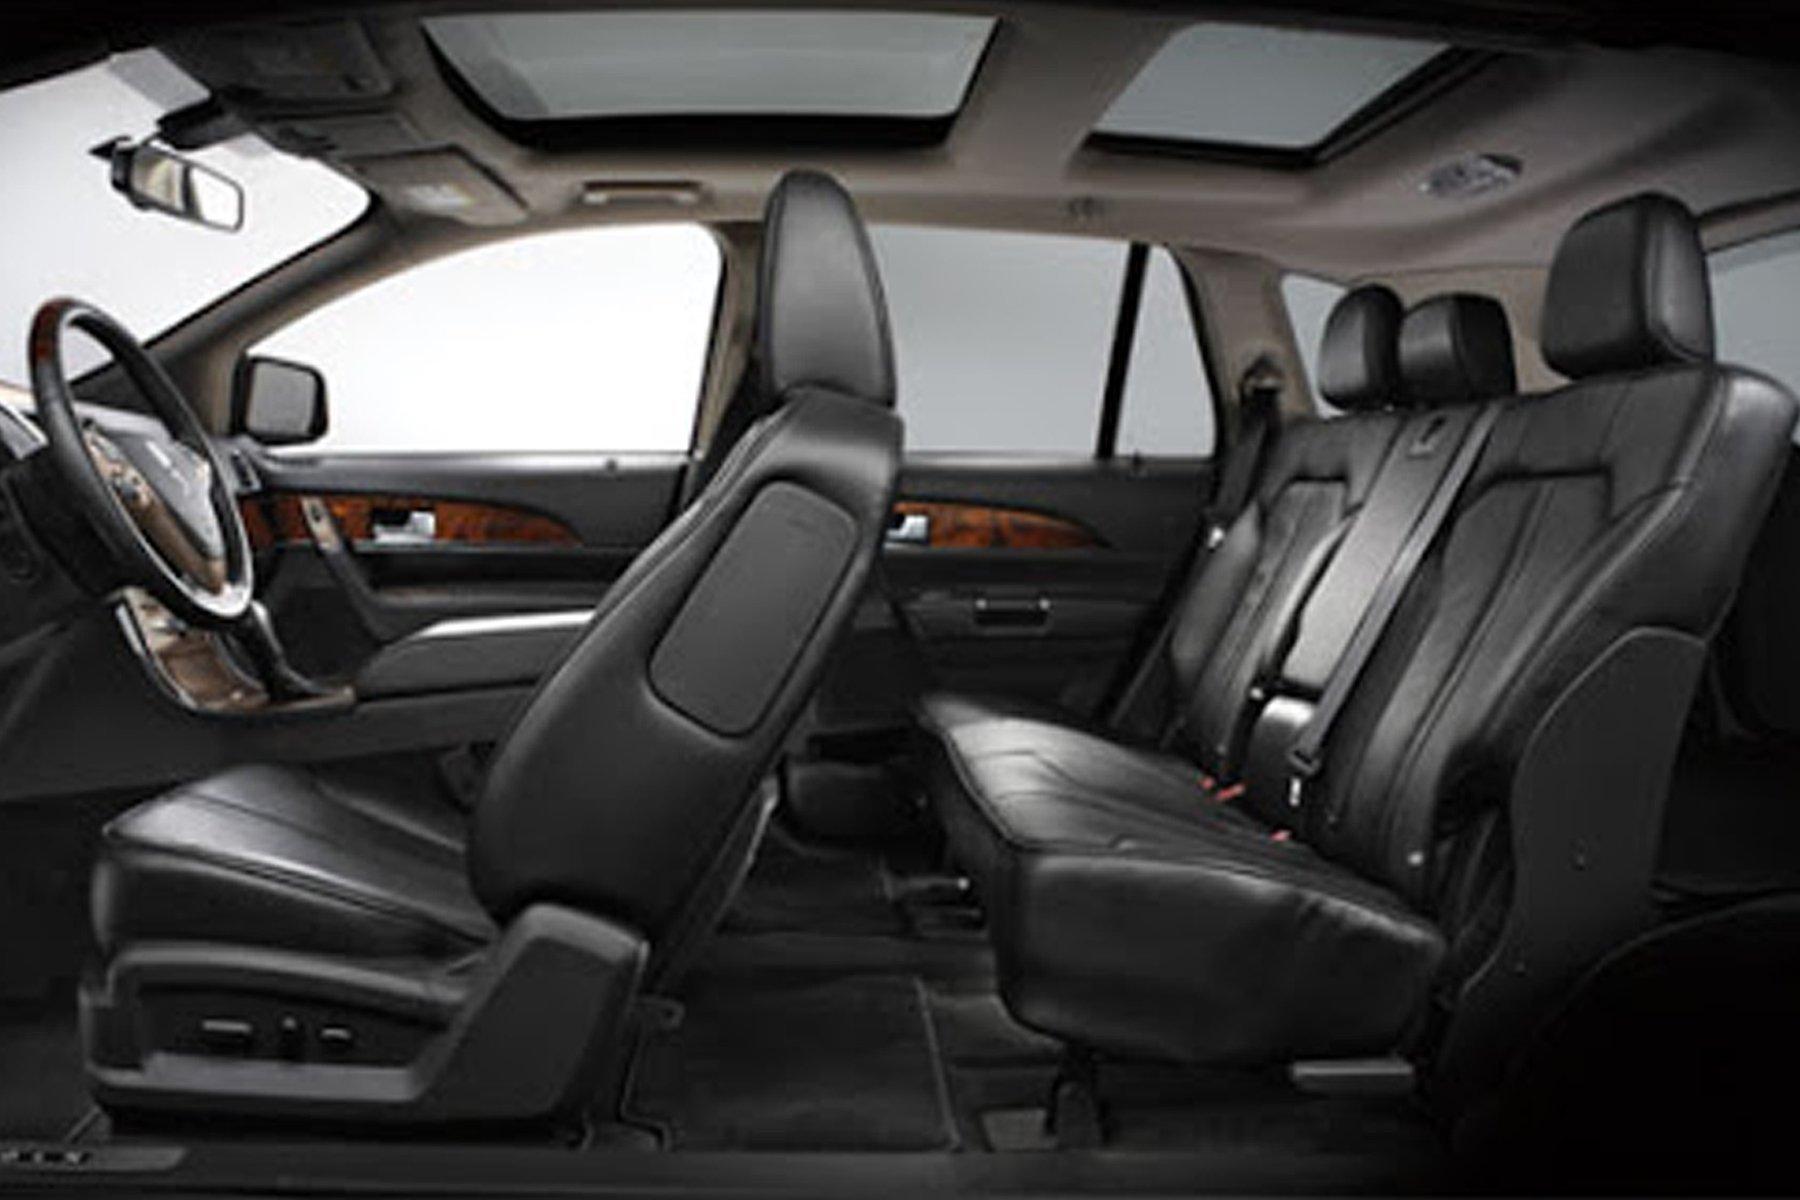 Skyline Chicago Limo Cars Luxury Fleet Black Lincoln MKT Interior October 2020